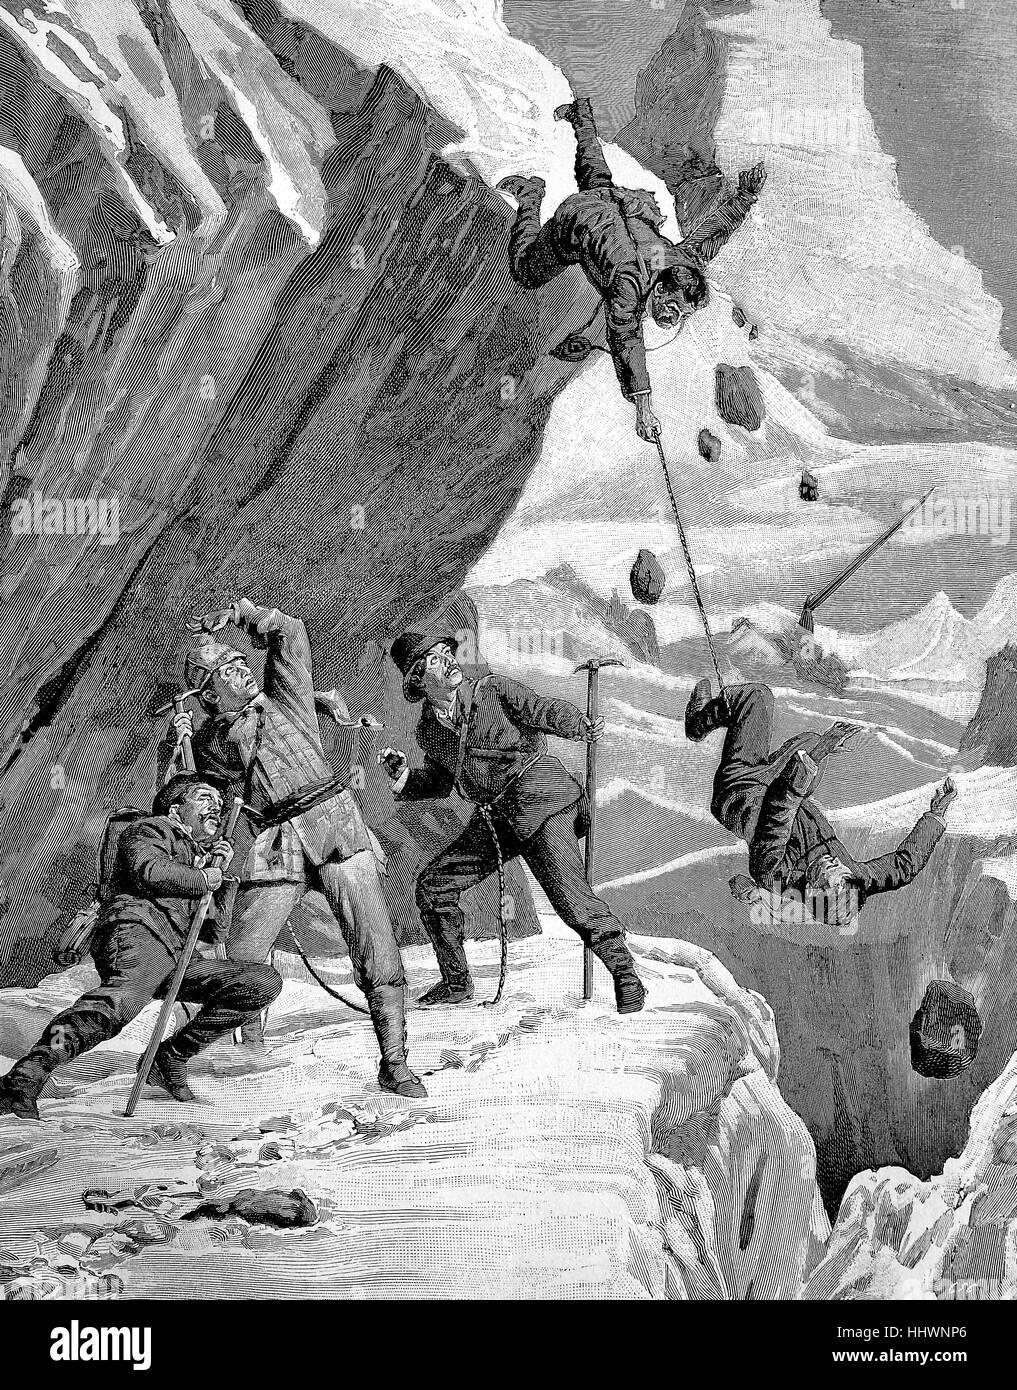 Mountaineers crash, disaster at the Matterhorn, Switzerland, historical image or illustration, published 1890, digital Stock Photo